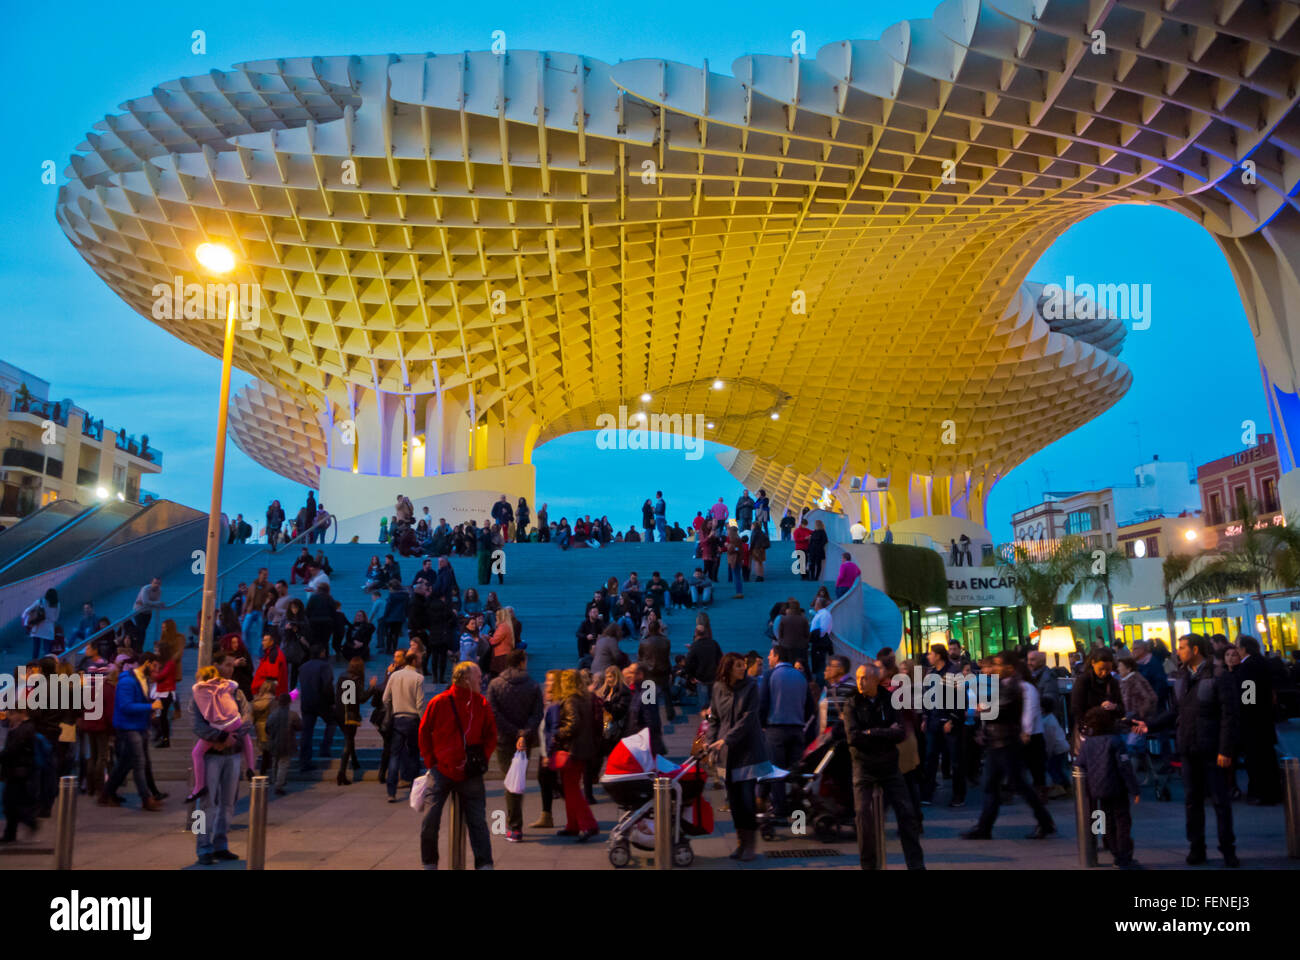 Espacio Metropol Parasol, Plaza de la Encarnacion, Sevilla, Andalucia, Spain - Stock Image